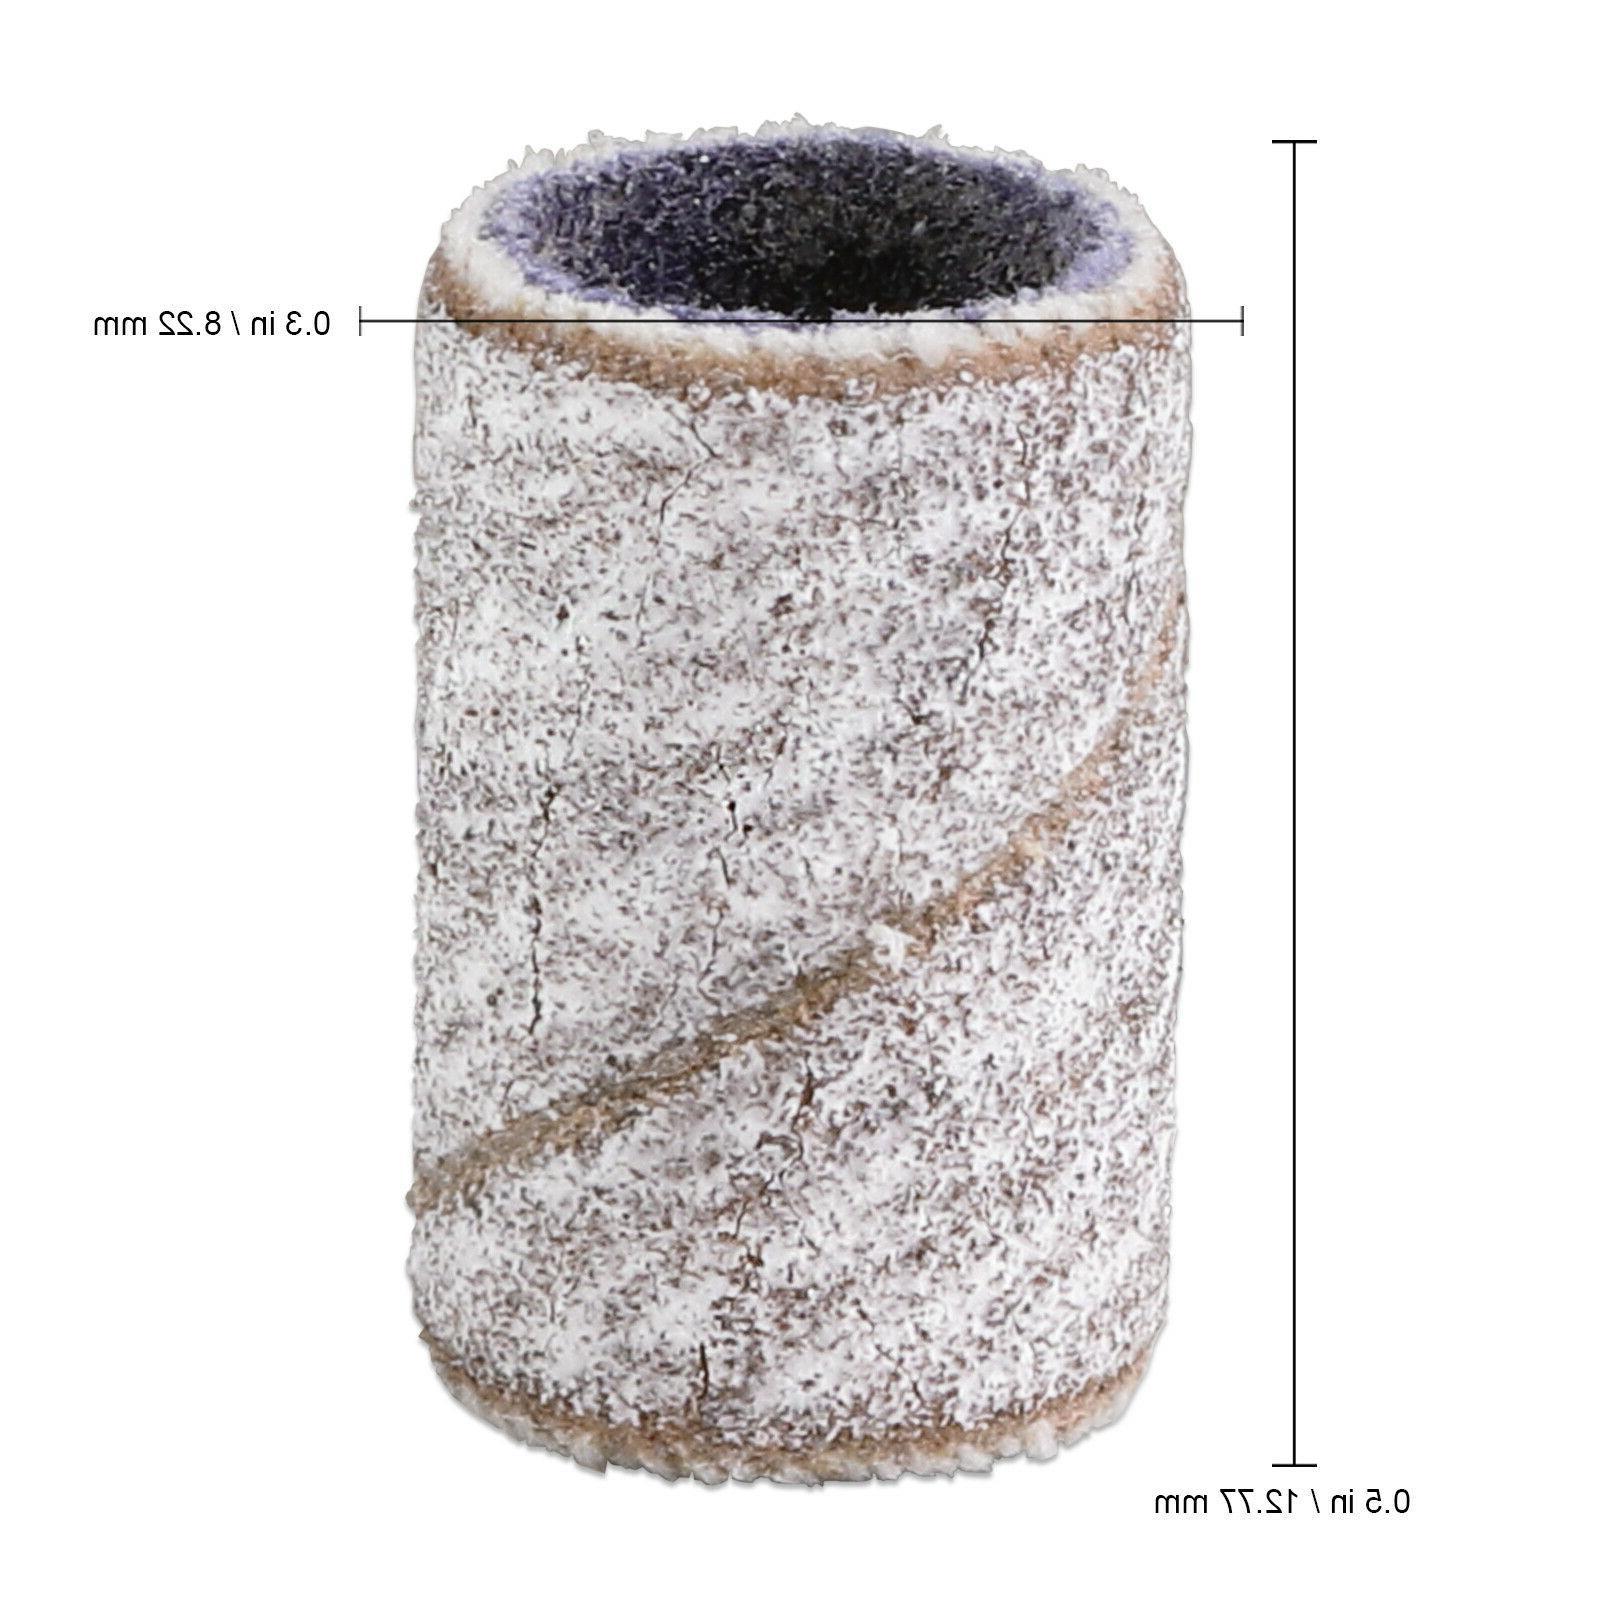 PANA 100 Pieces Sanding Bands Nail Drill Bits File